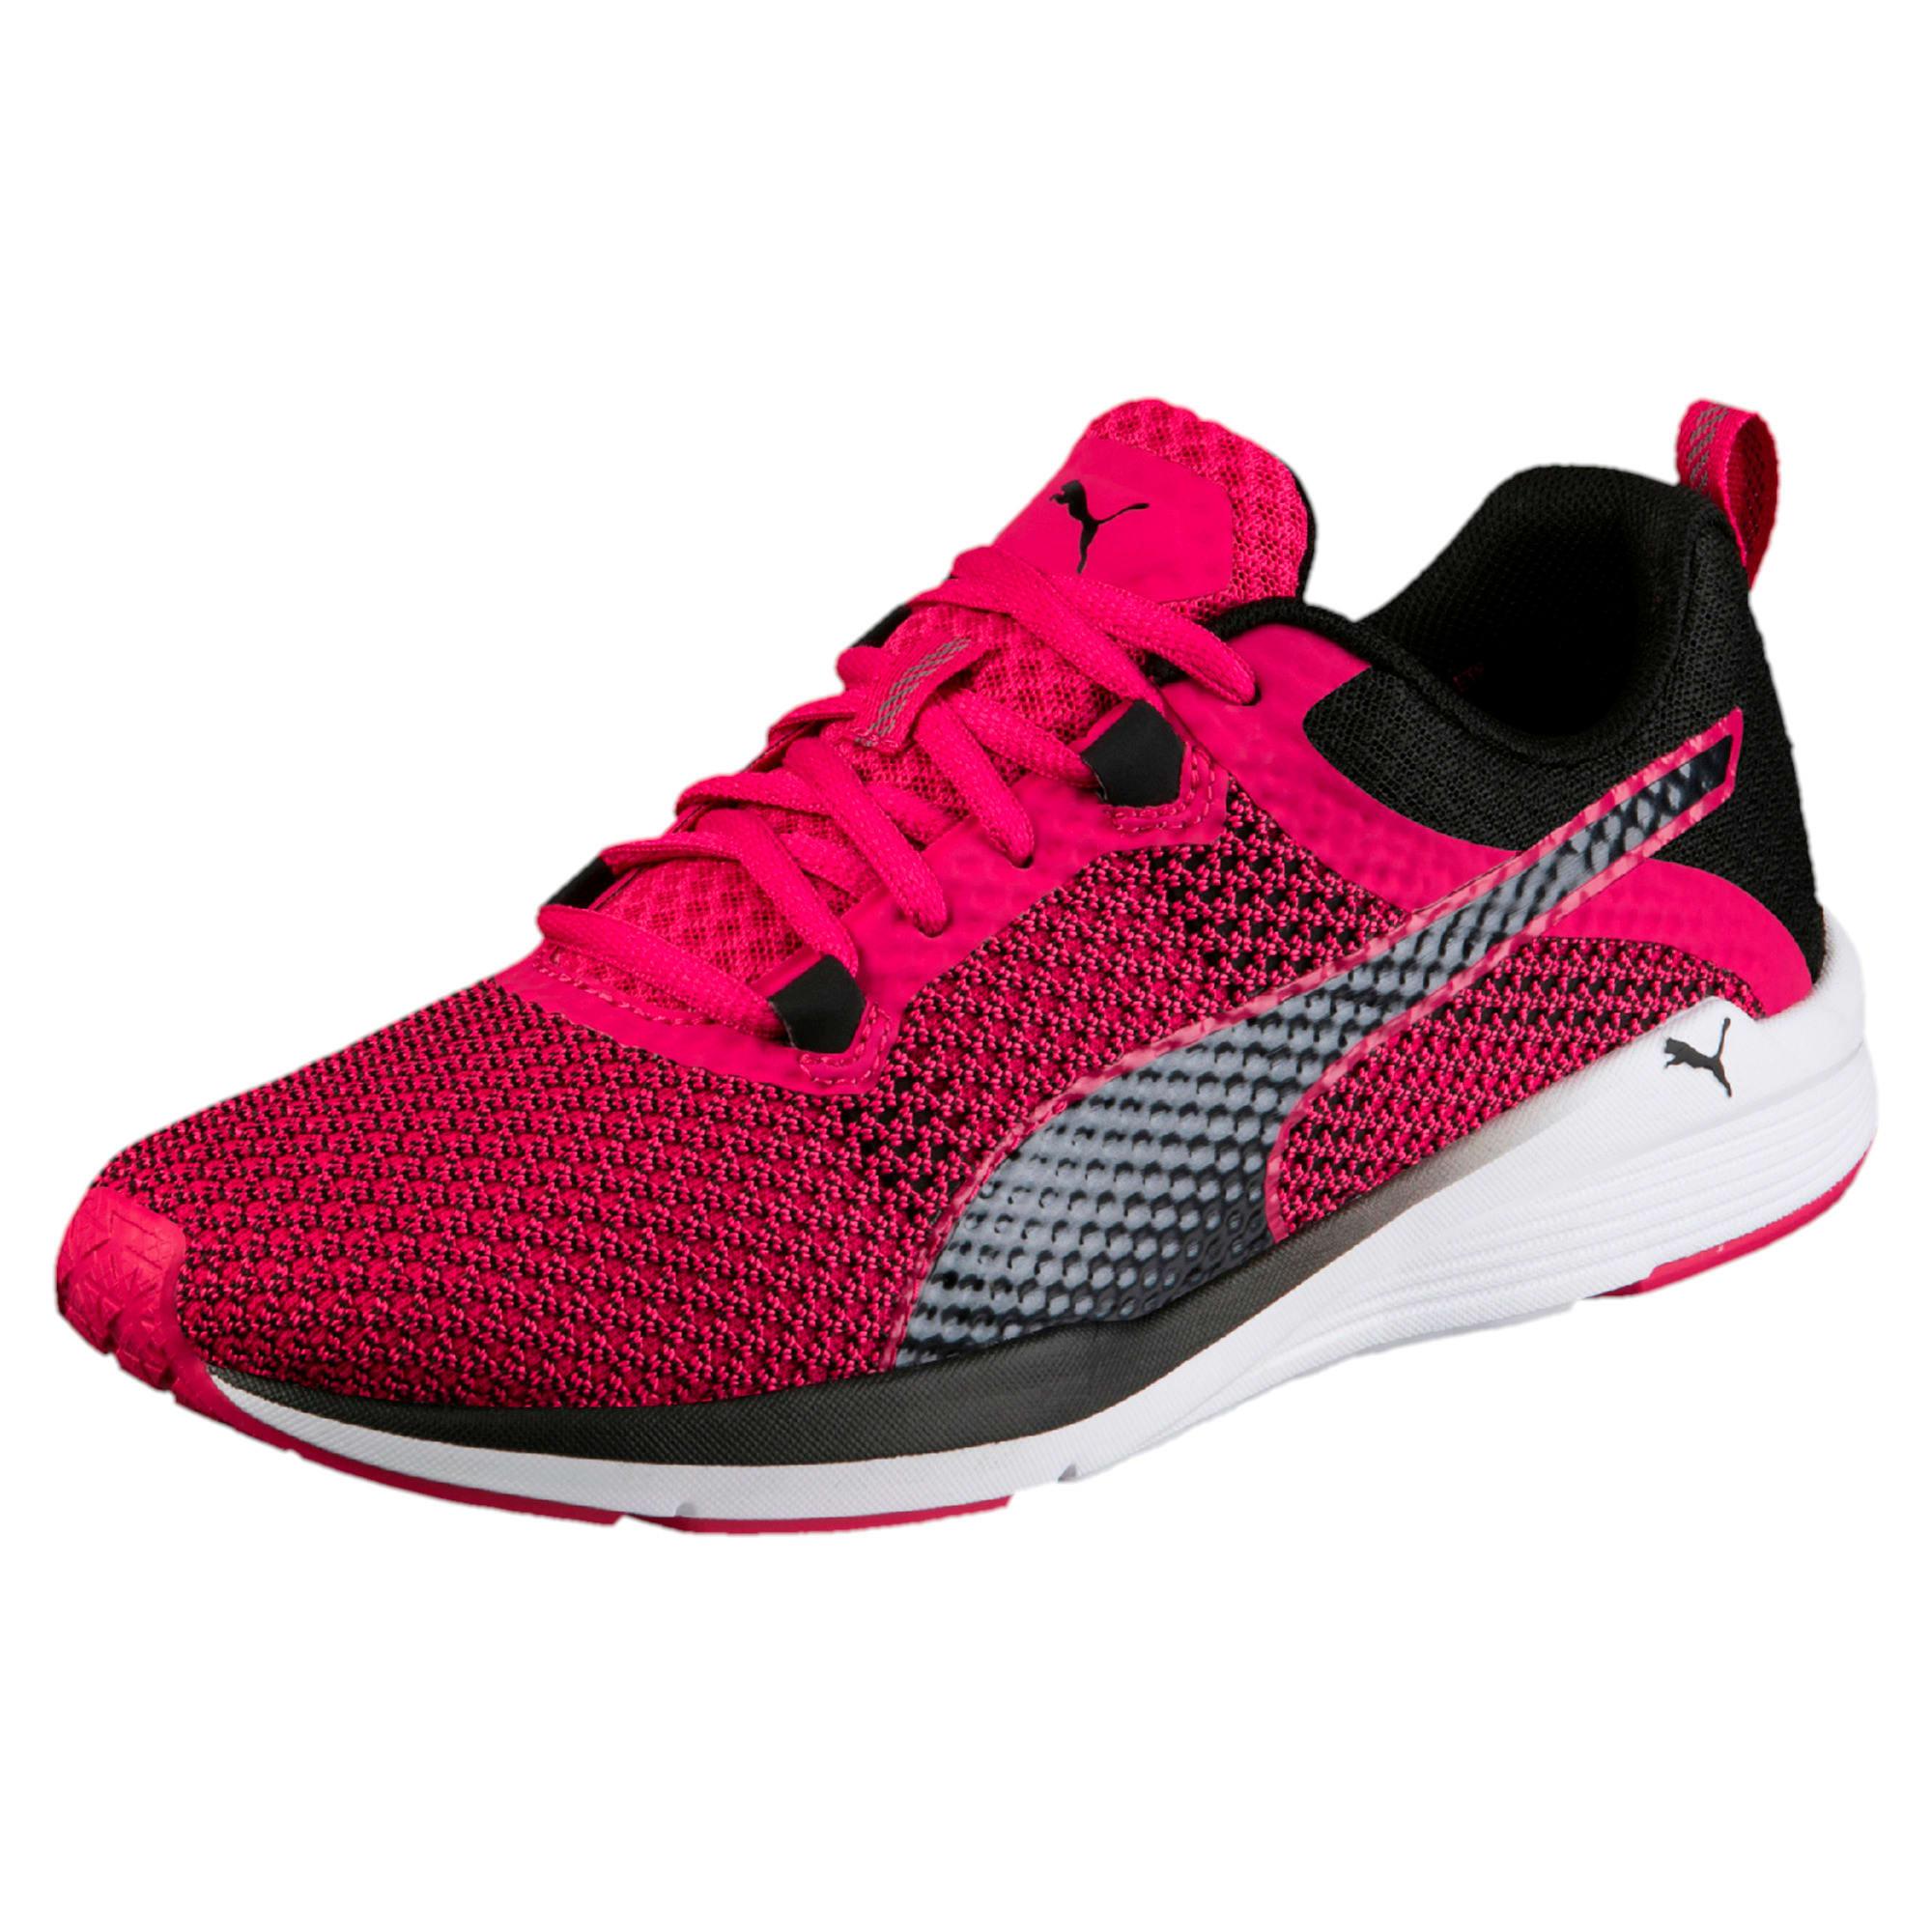 Thumbnail 1 of Pulse IGNITE XT Women's Training Shoes, Love Potion-Puma Black, medium-IND